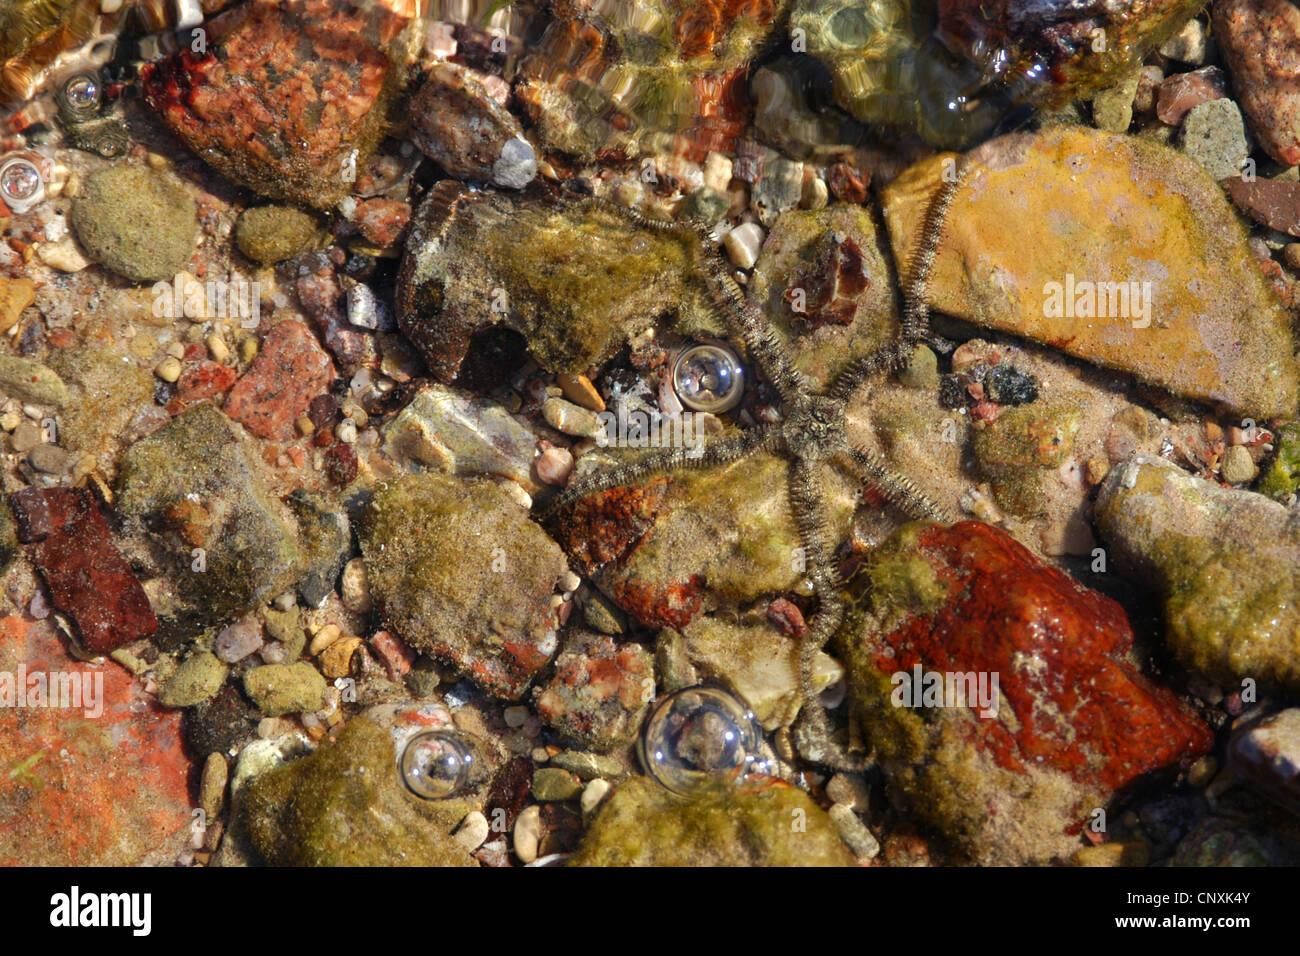 Starfish in the Red Sea on Nuweiba sea resort on Sinai Peninsula, Egypt. - Stock Image